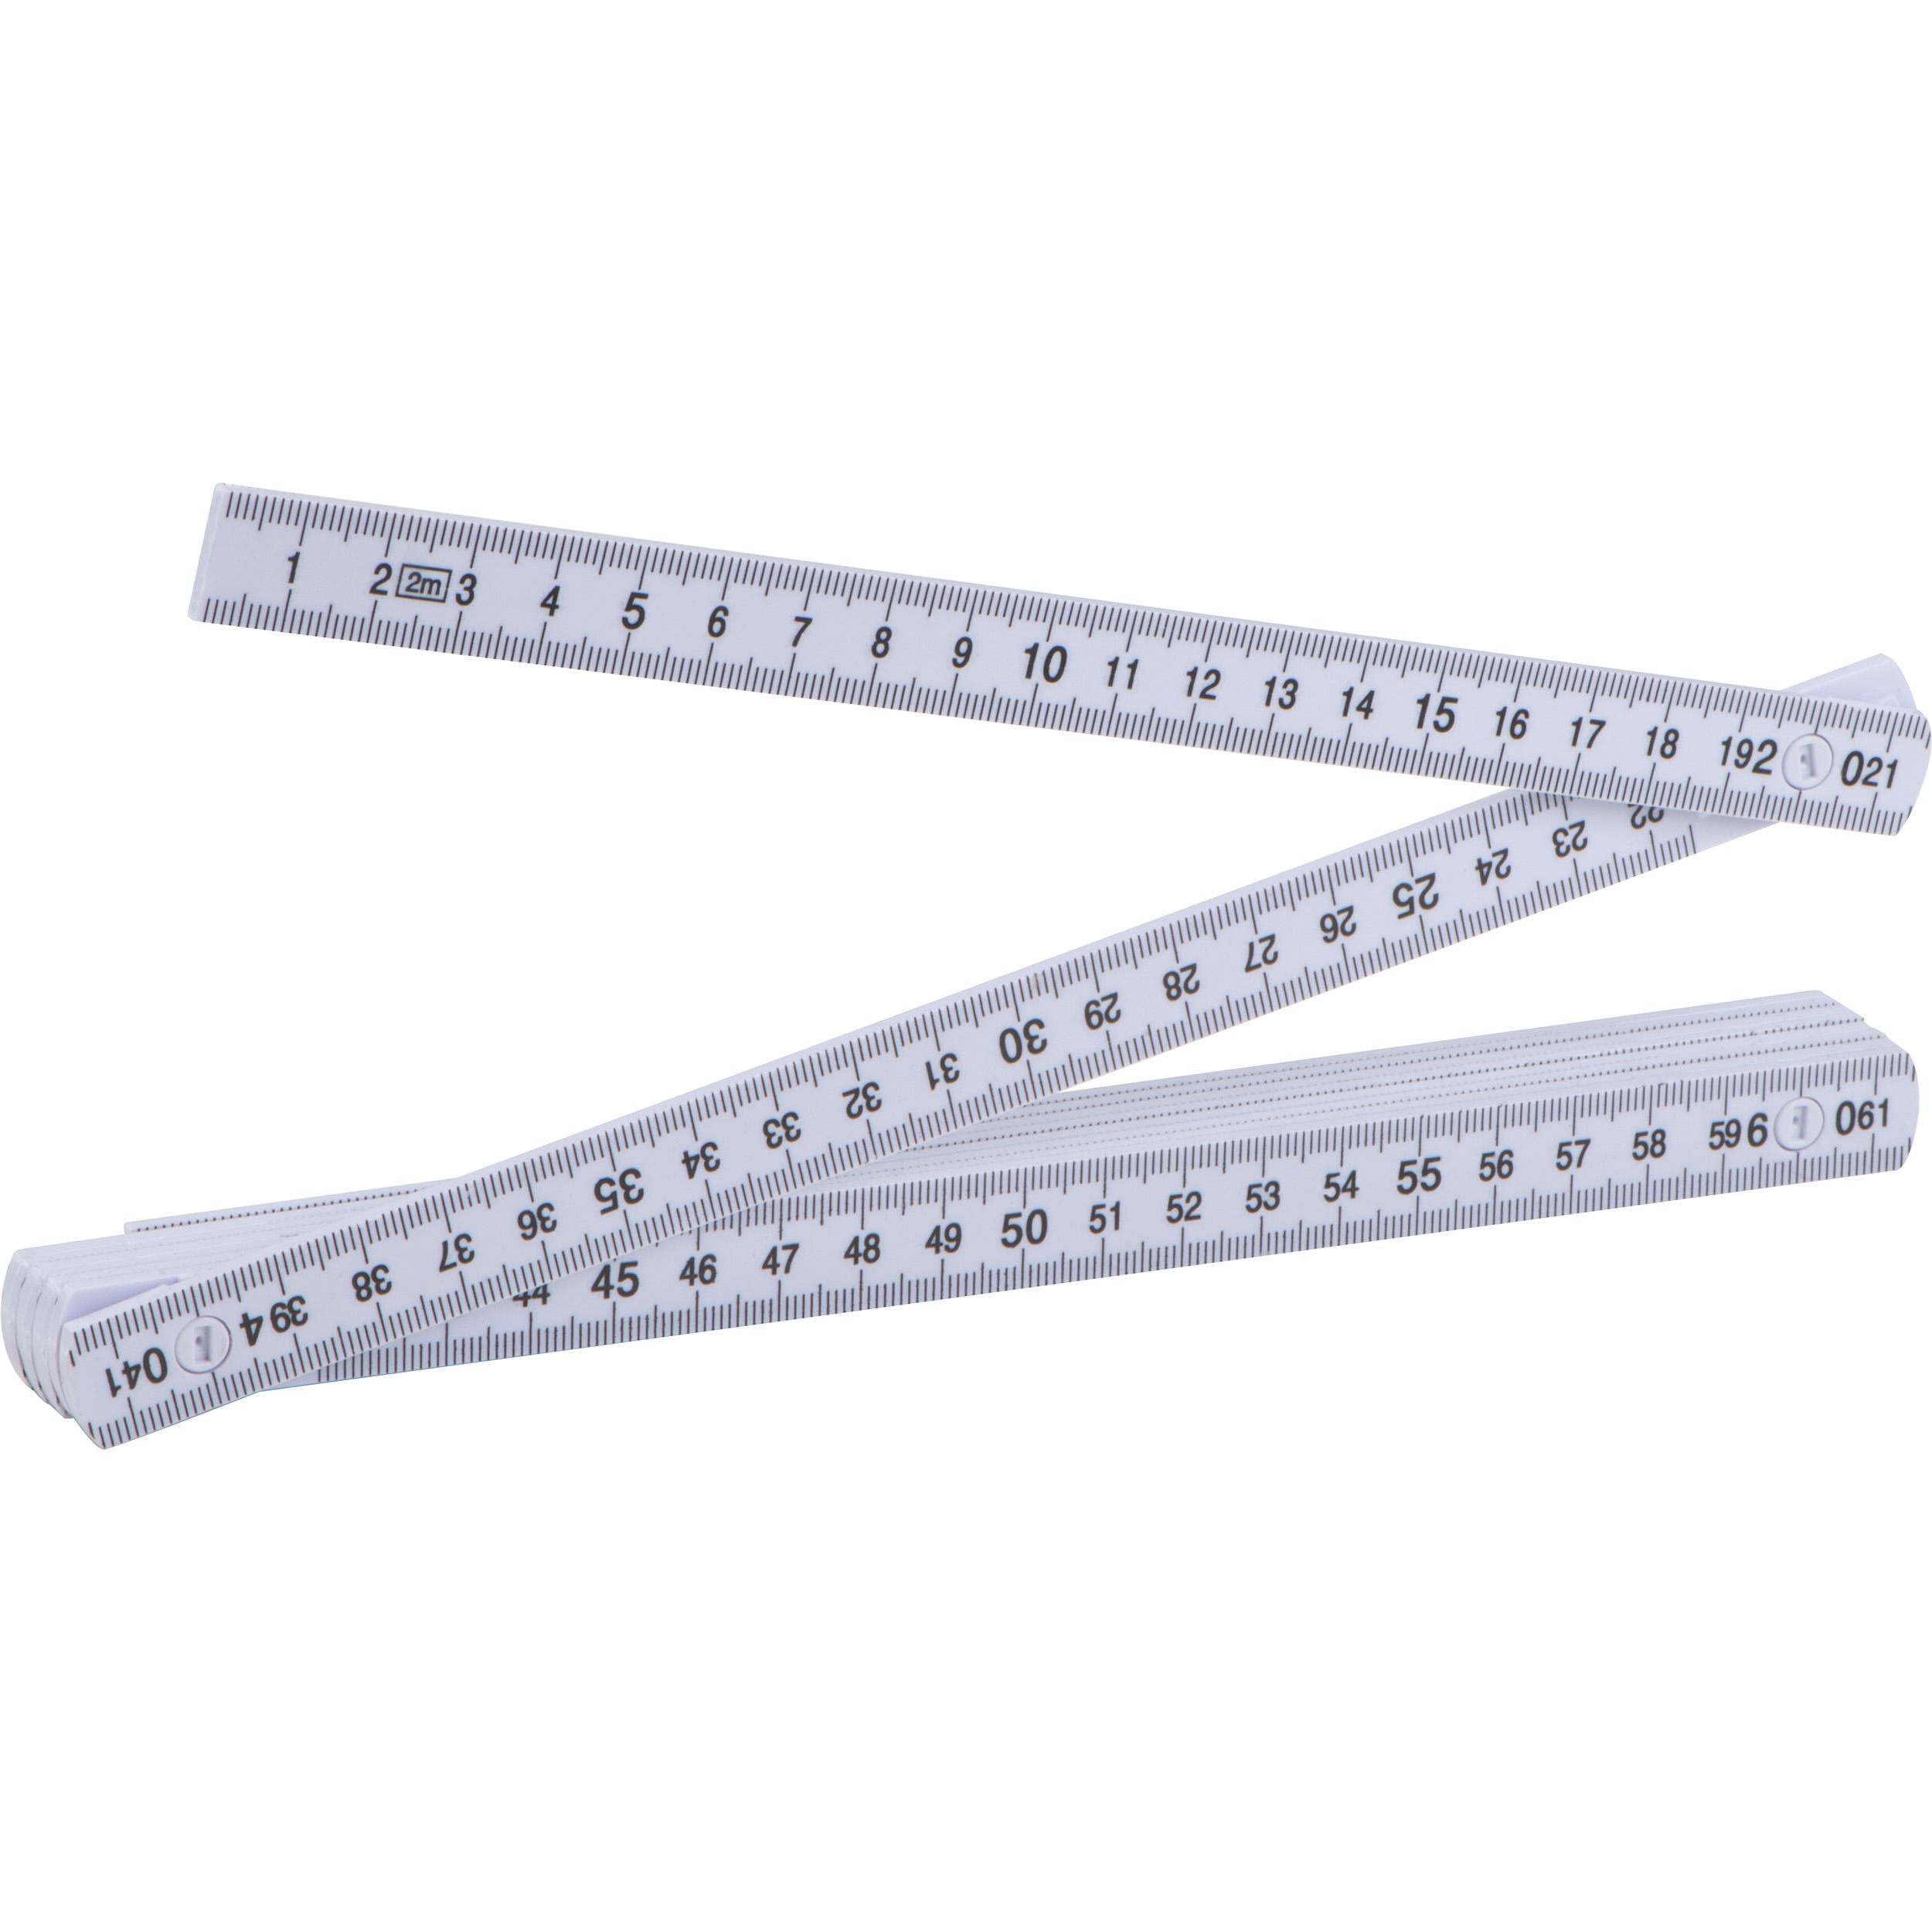 2m yardstick